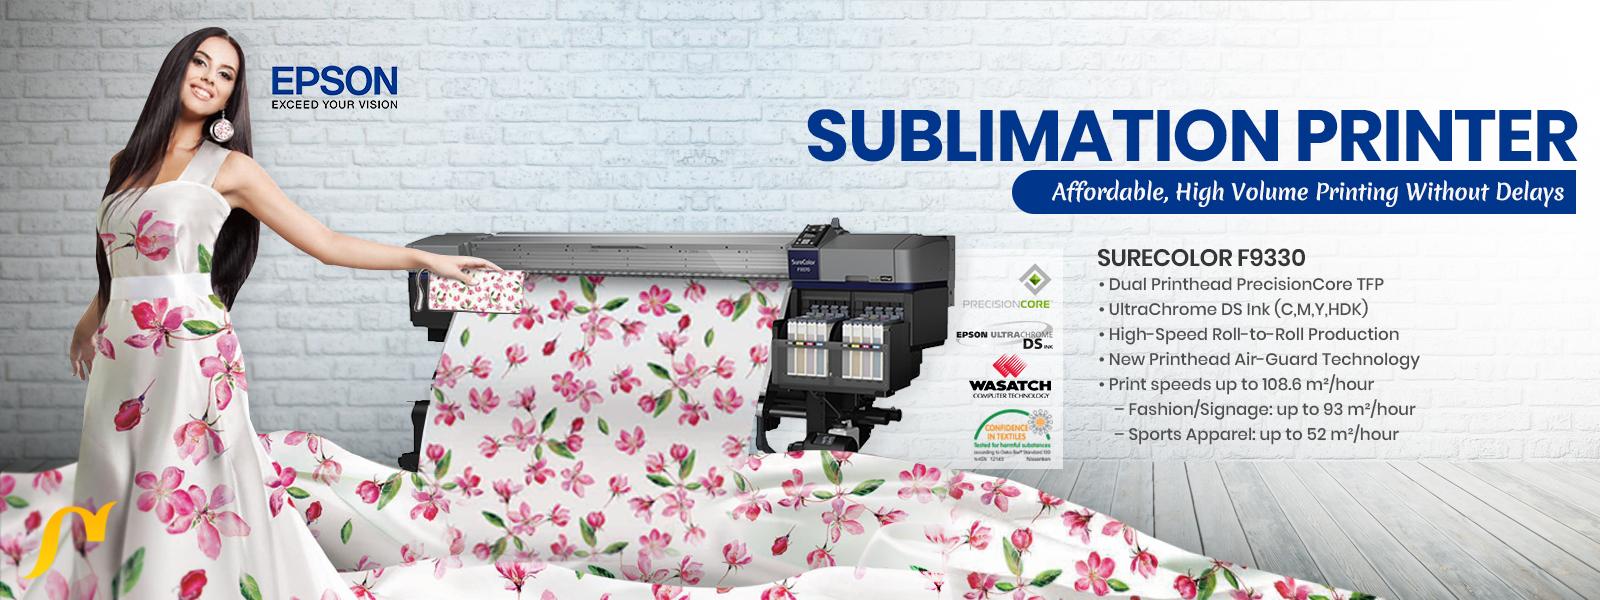 epson sublimation printer slider